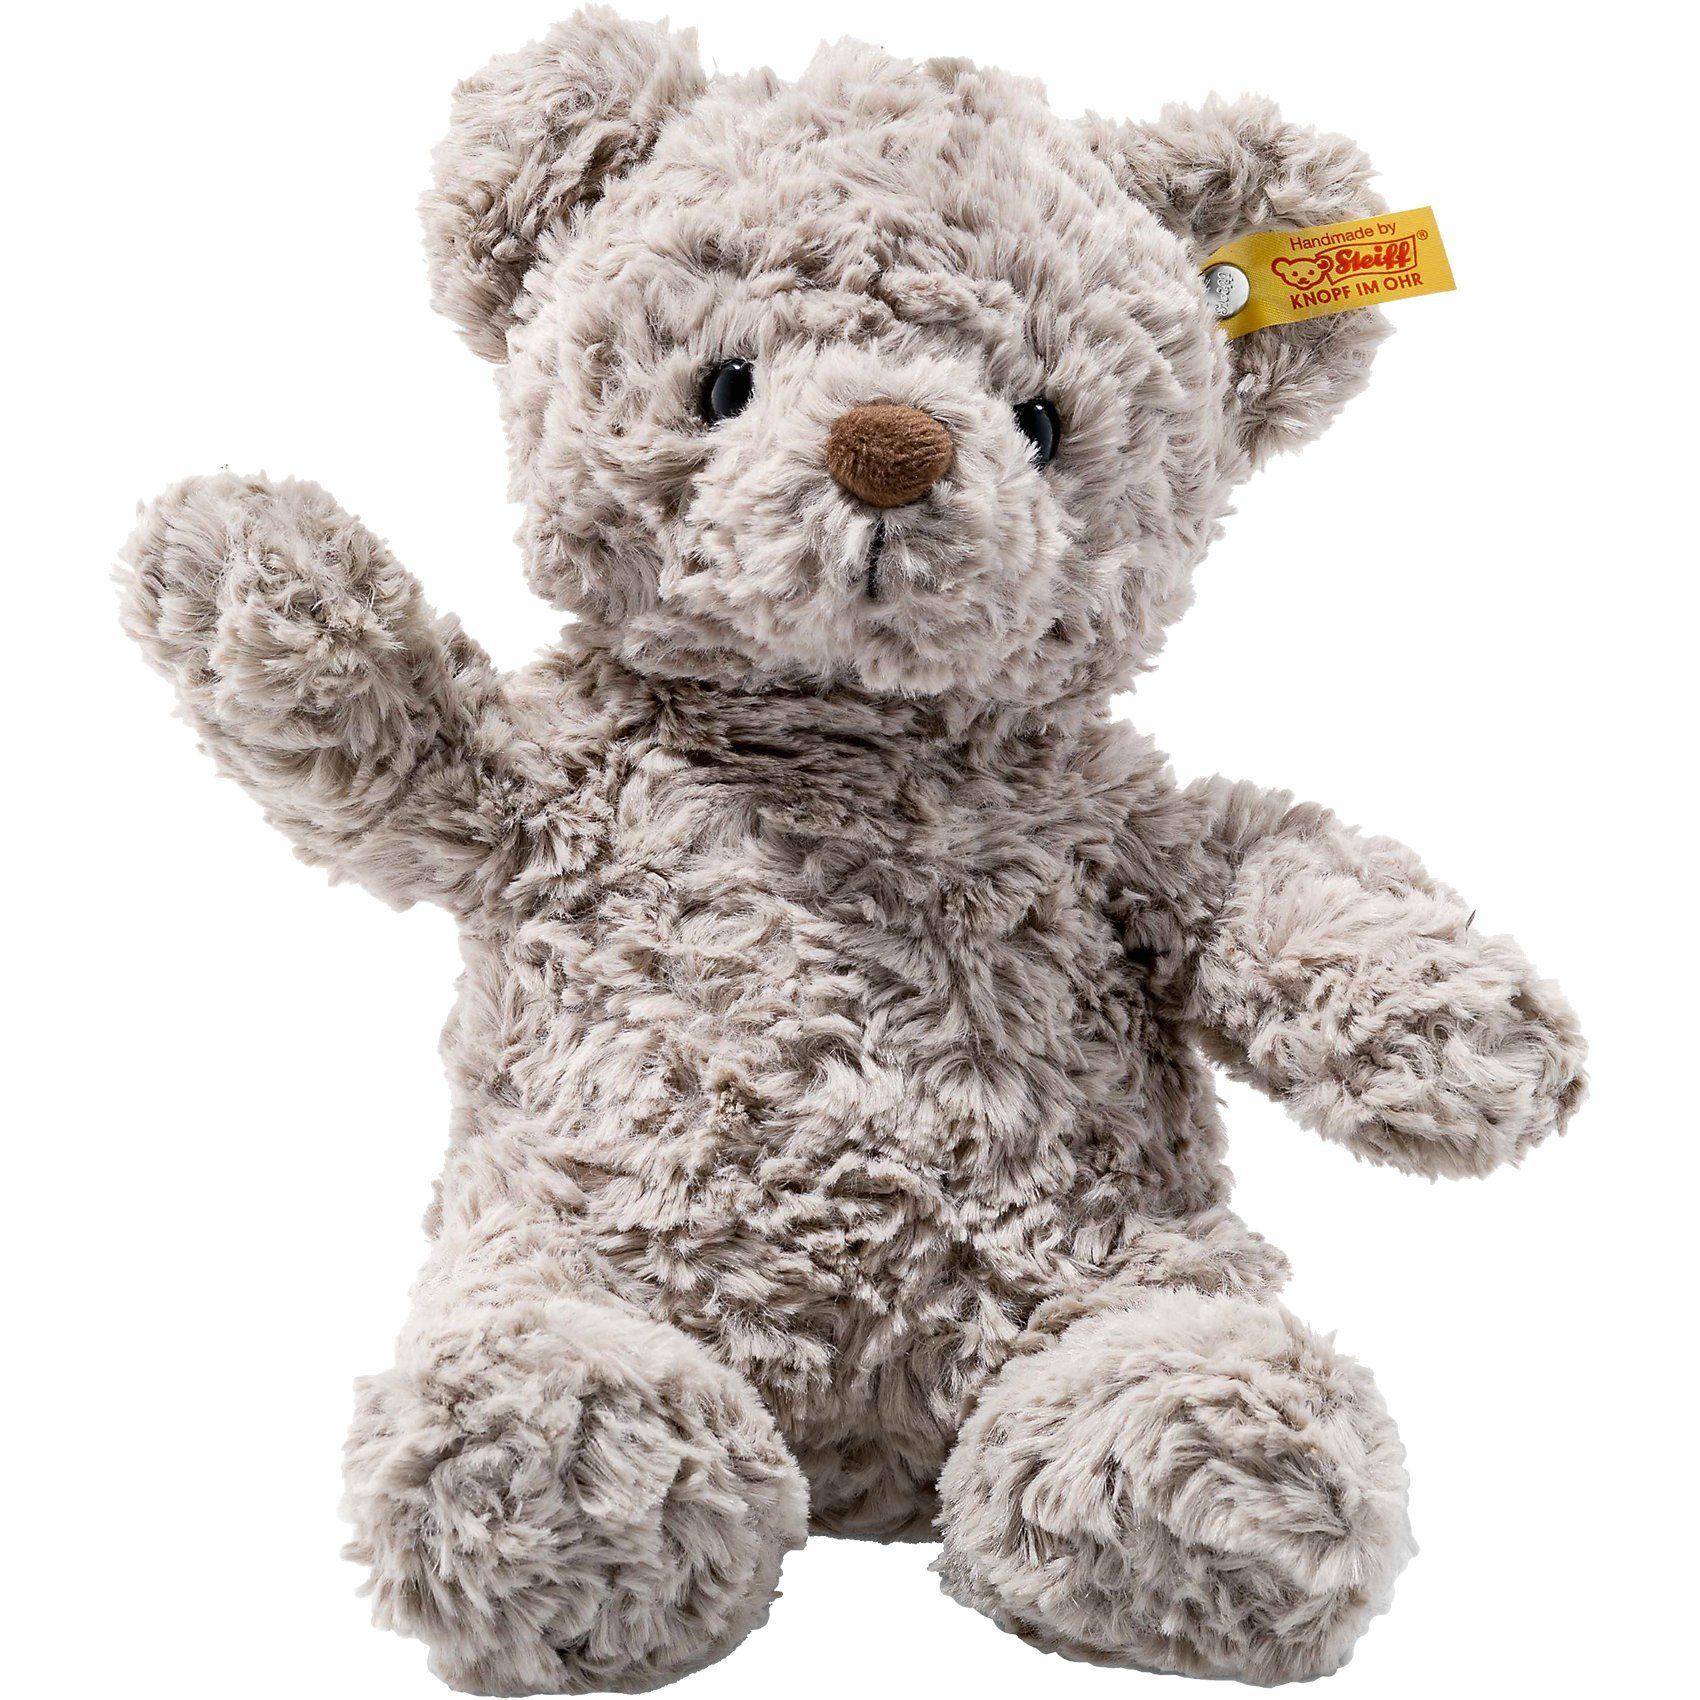 Steiff Honey Teddyb. grau, 28 cm